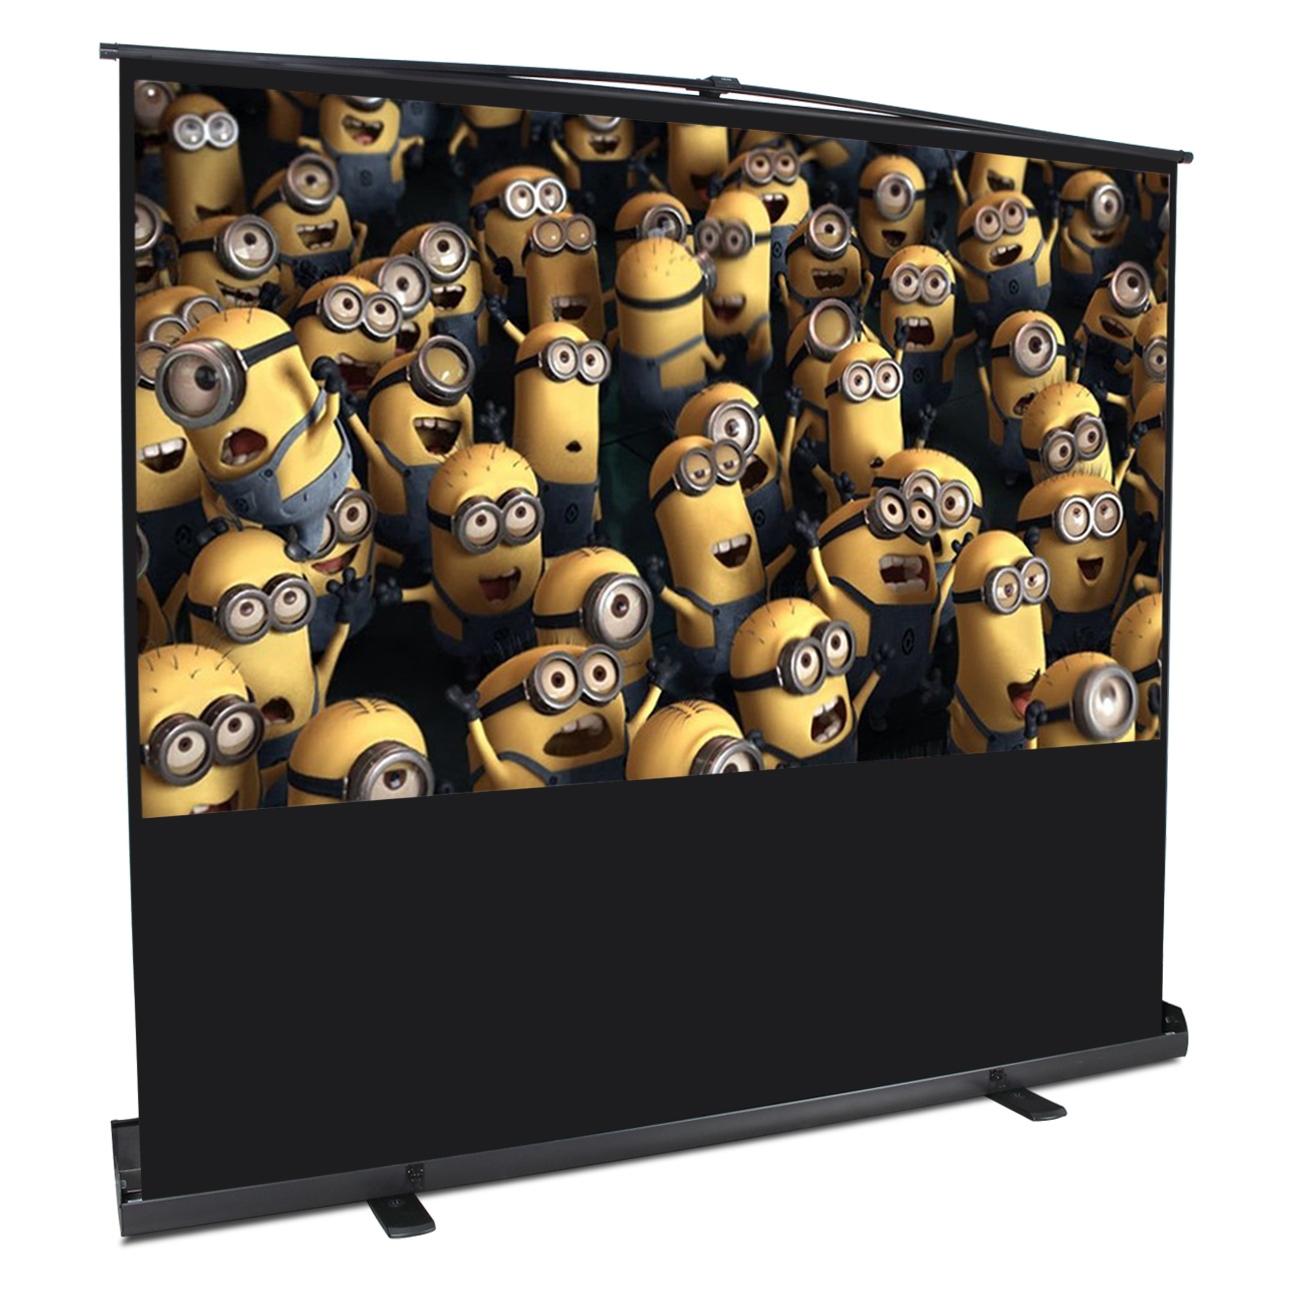 Arksen Indoor Outdoor Portable Movie Screen 80 Inch 4:3 Home Cinema HD Projector Screen Pull Up w Aluminium... by Arksen